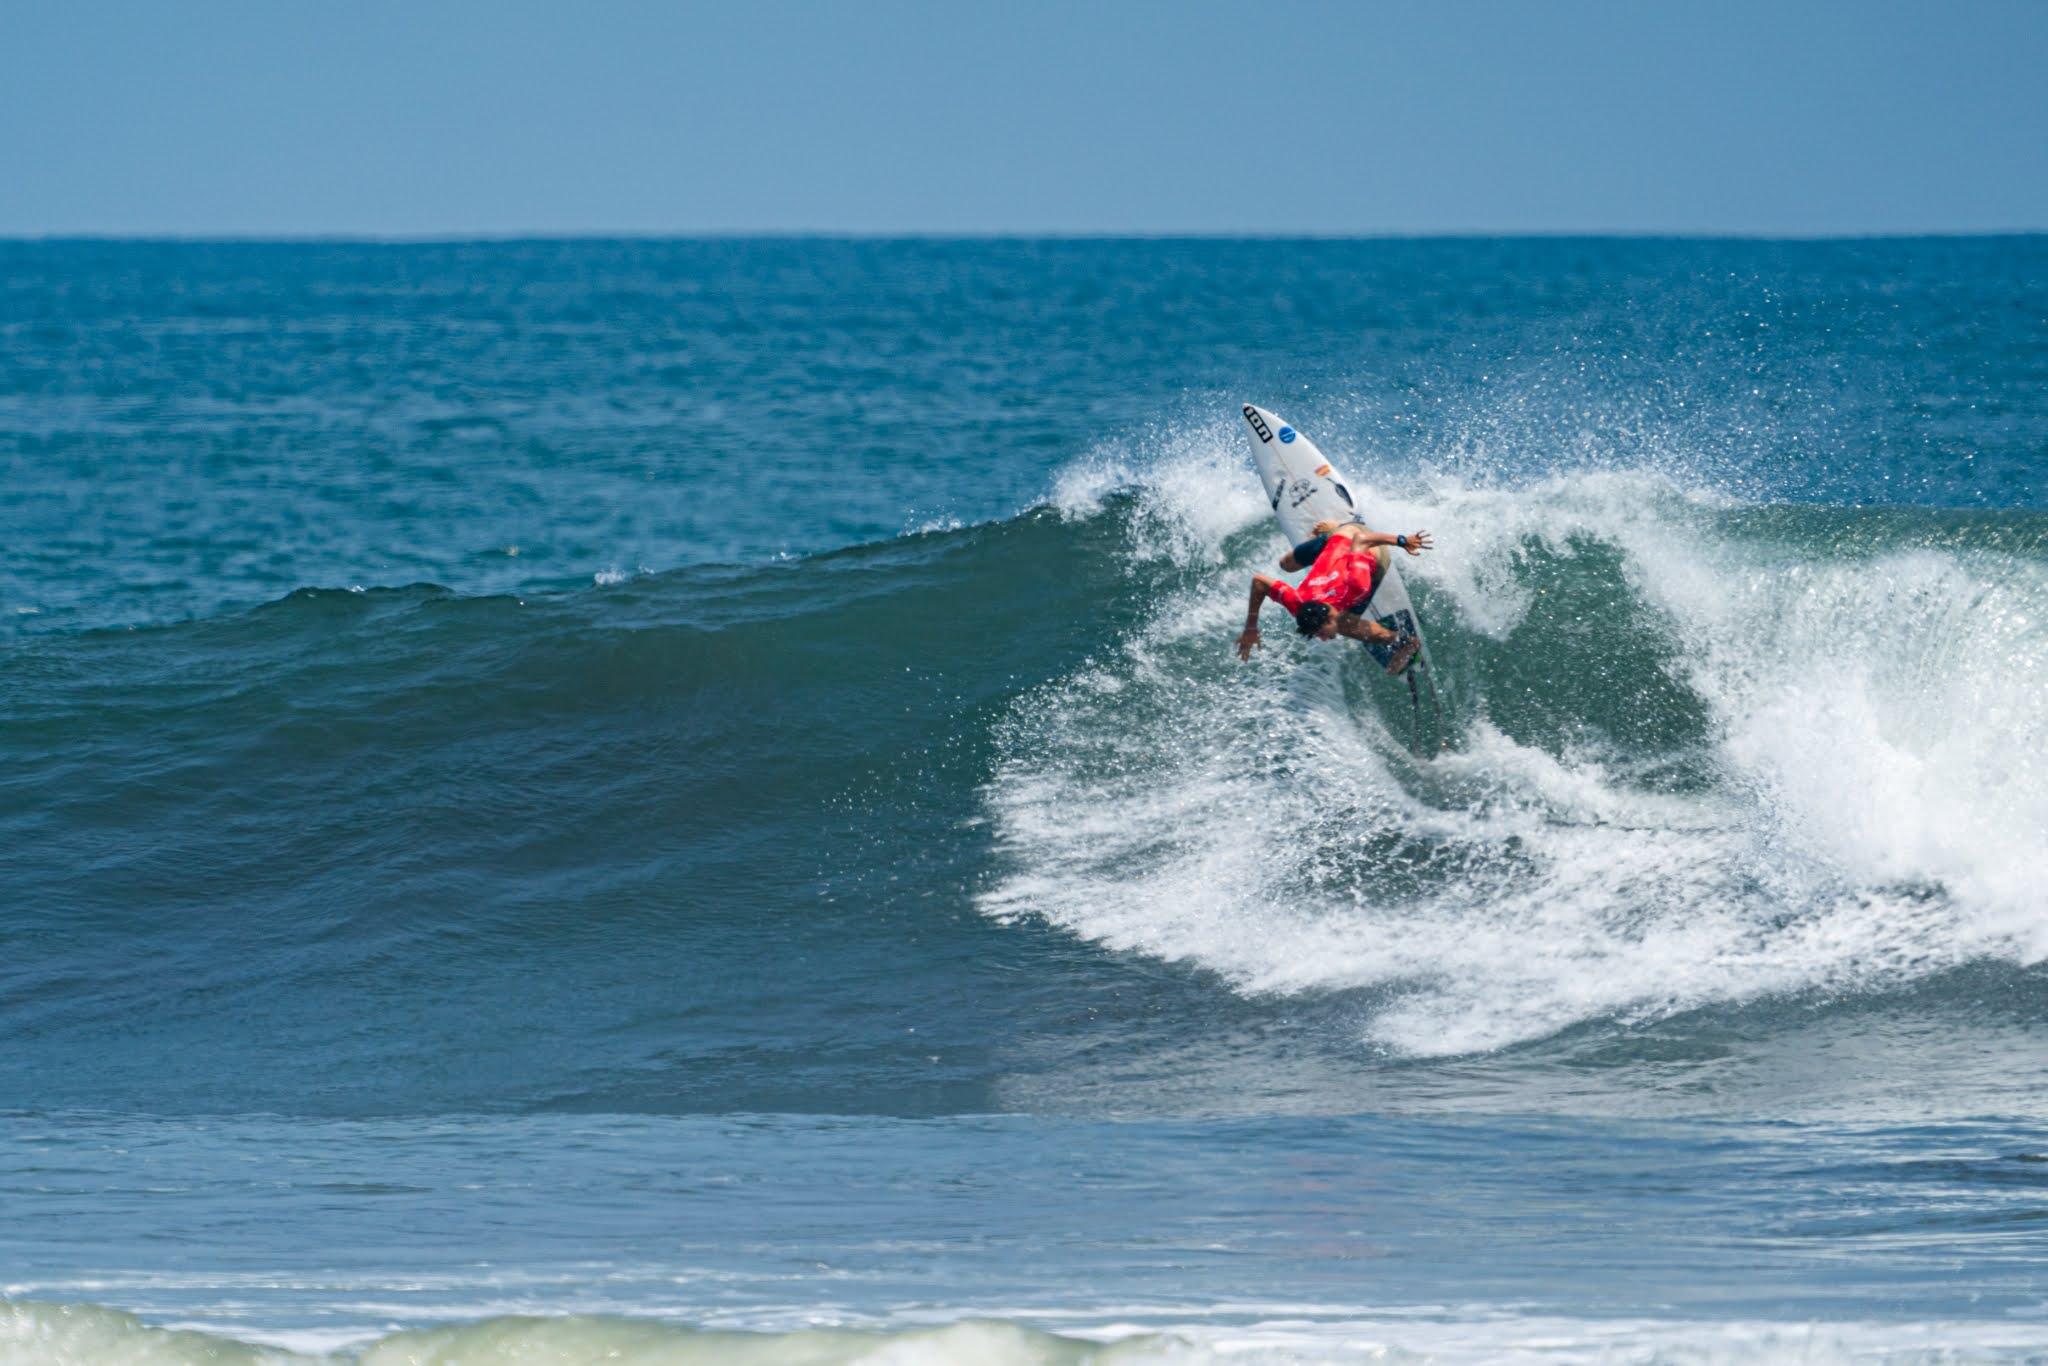 WSG SURF CITY EL SALVADOR 2021 DIA 4